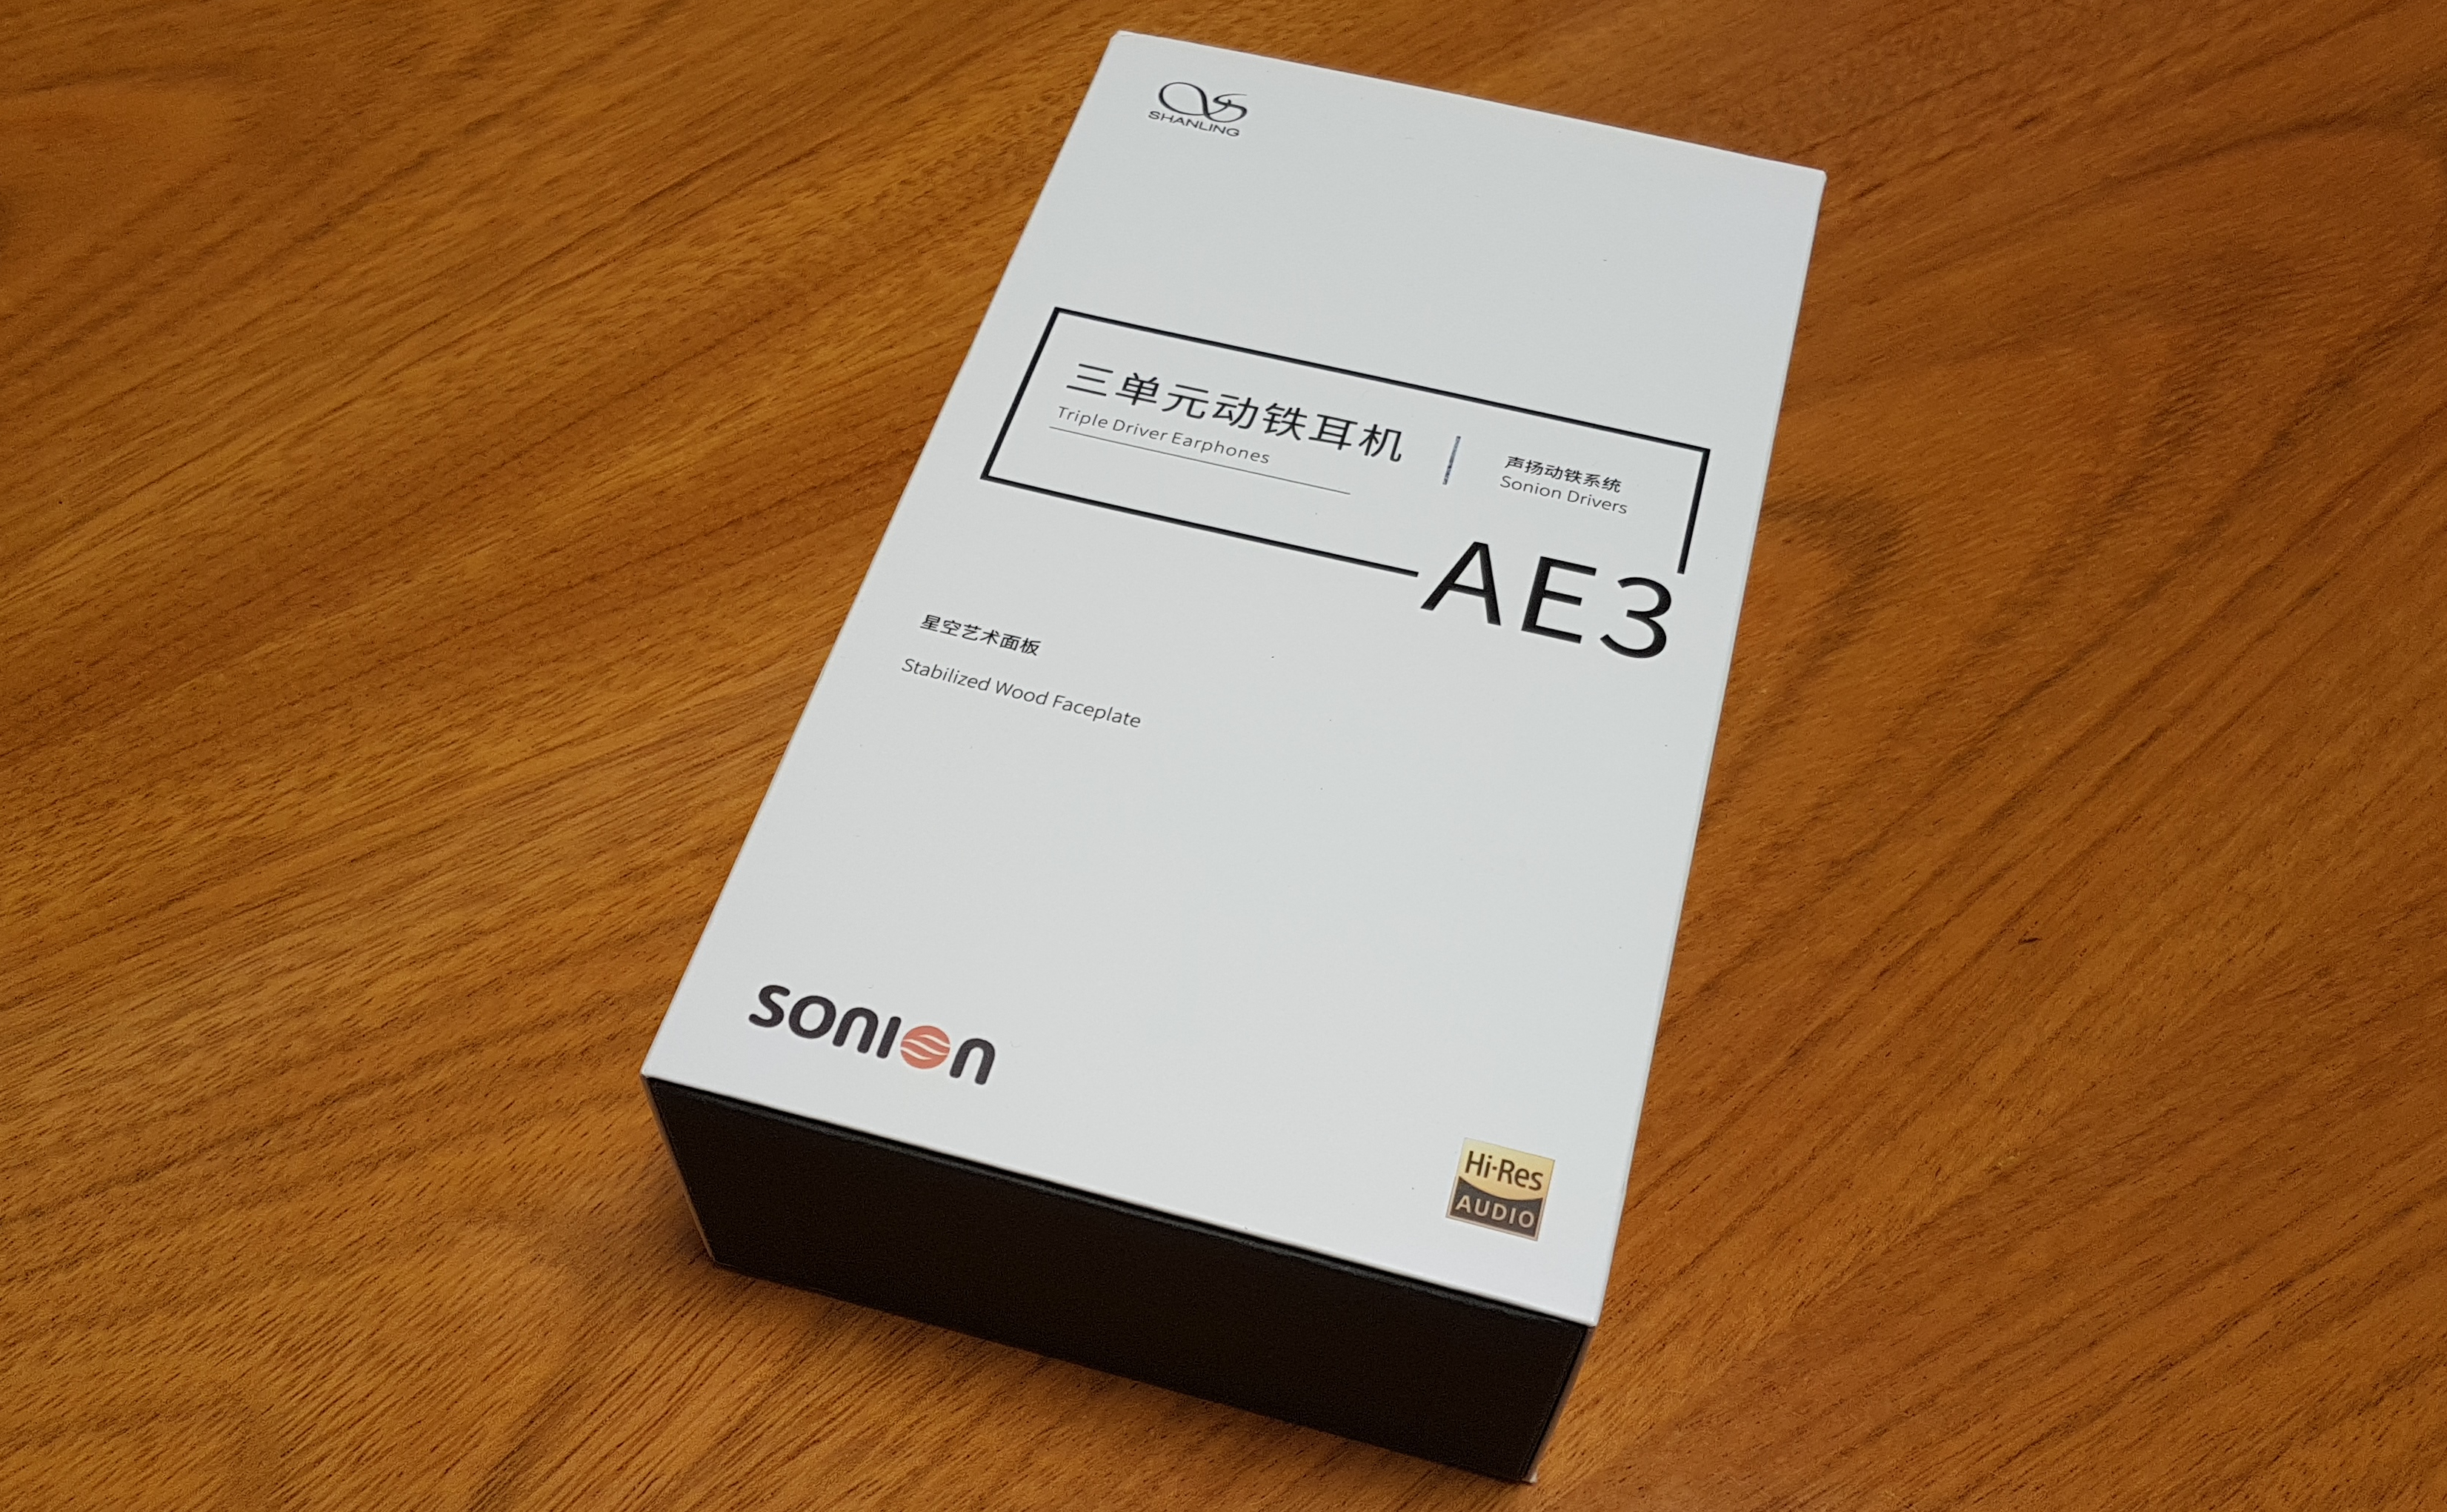 ae3 (2).jpg